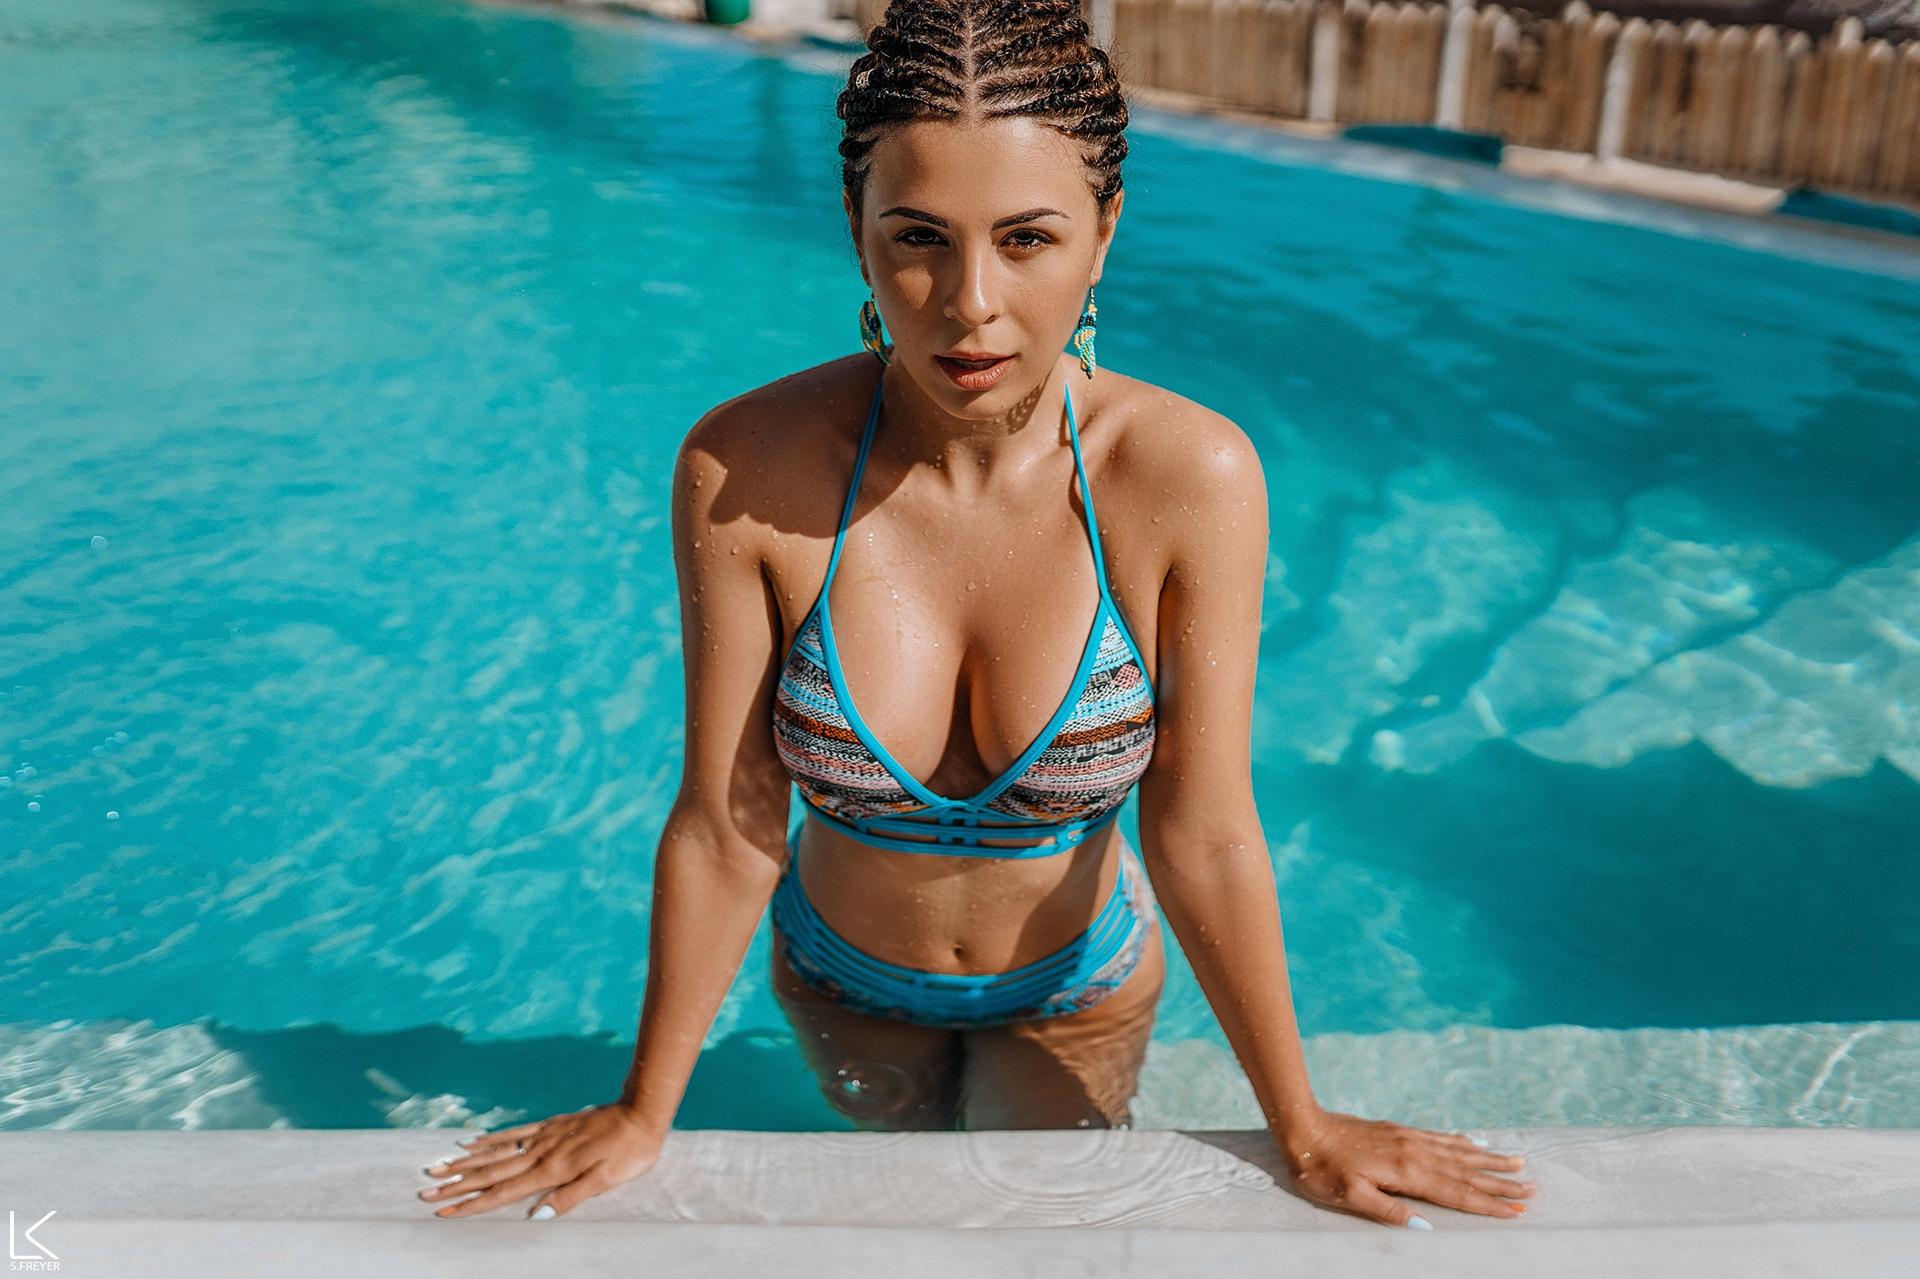 People 1920x1279 women Sergey Freyer swimming pool wet body wet hair women outdoors belly brunette model braided hair swimwear blue bikini boobs cleavage